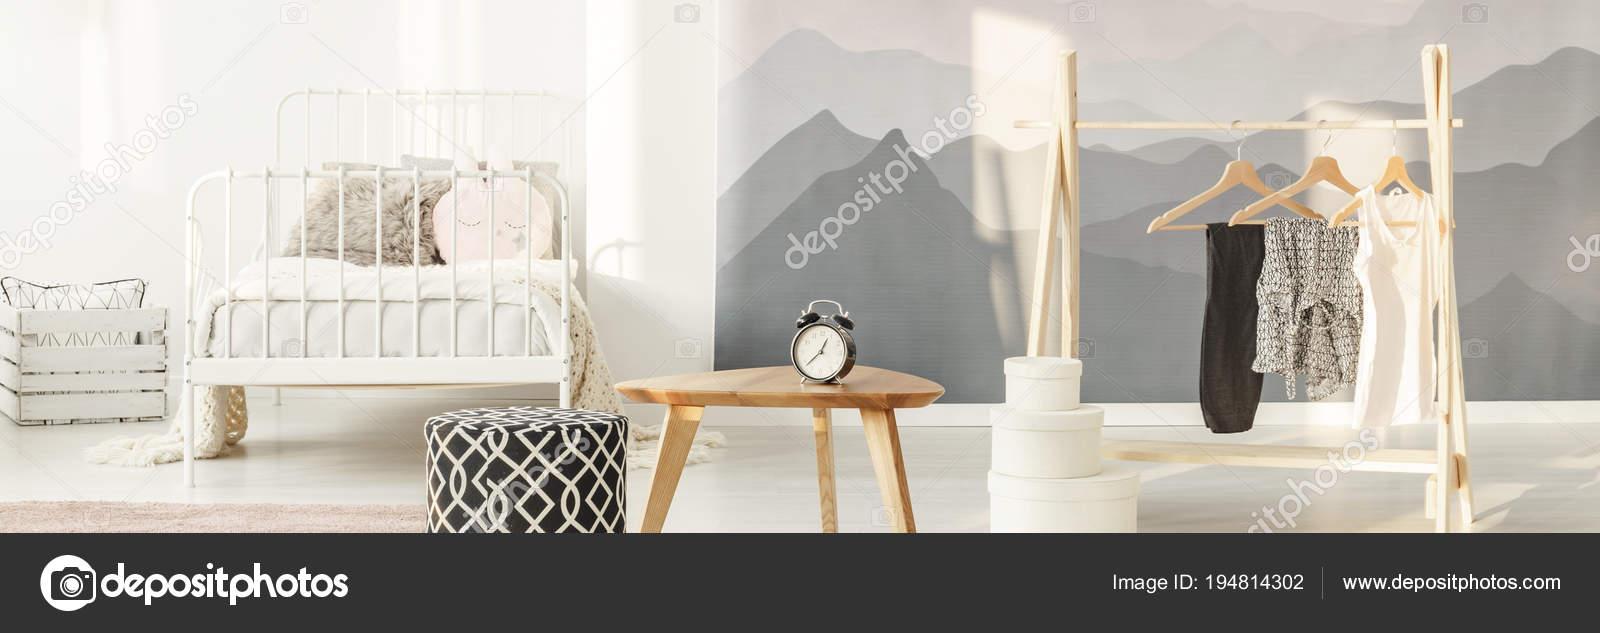 https://st3.depositphotos.com/2249091/19481/i/1600/depositphotos_194814302-stockafbeelding-klok-en-kleding-in-de.jpg